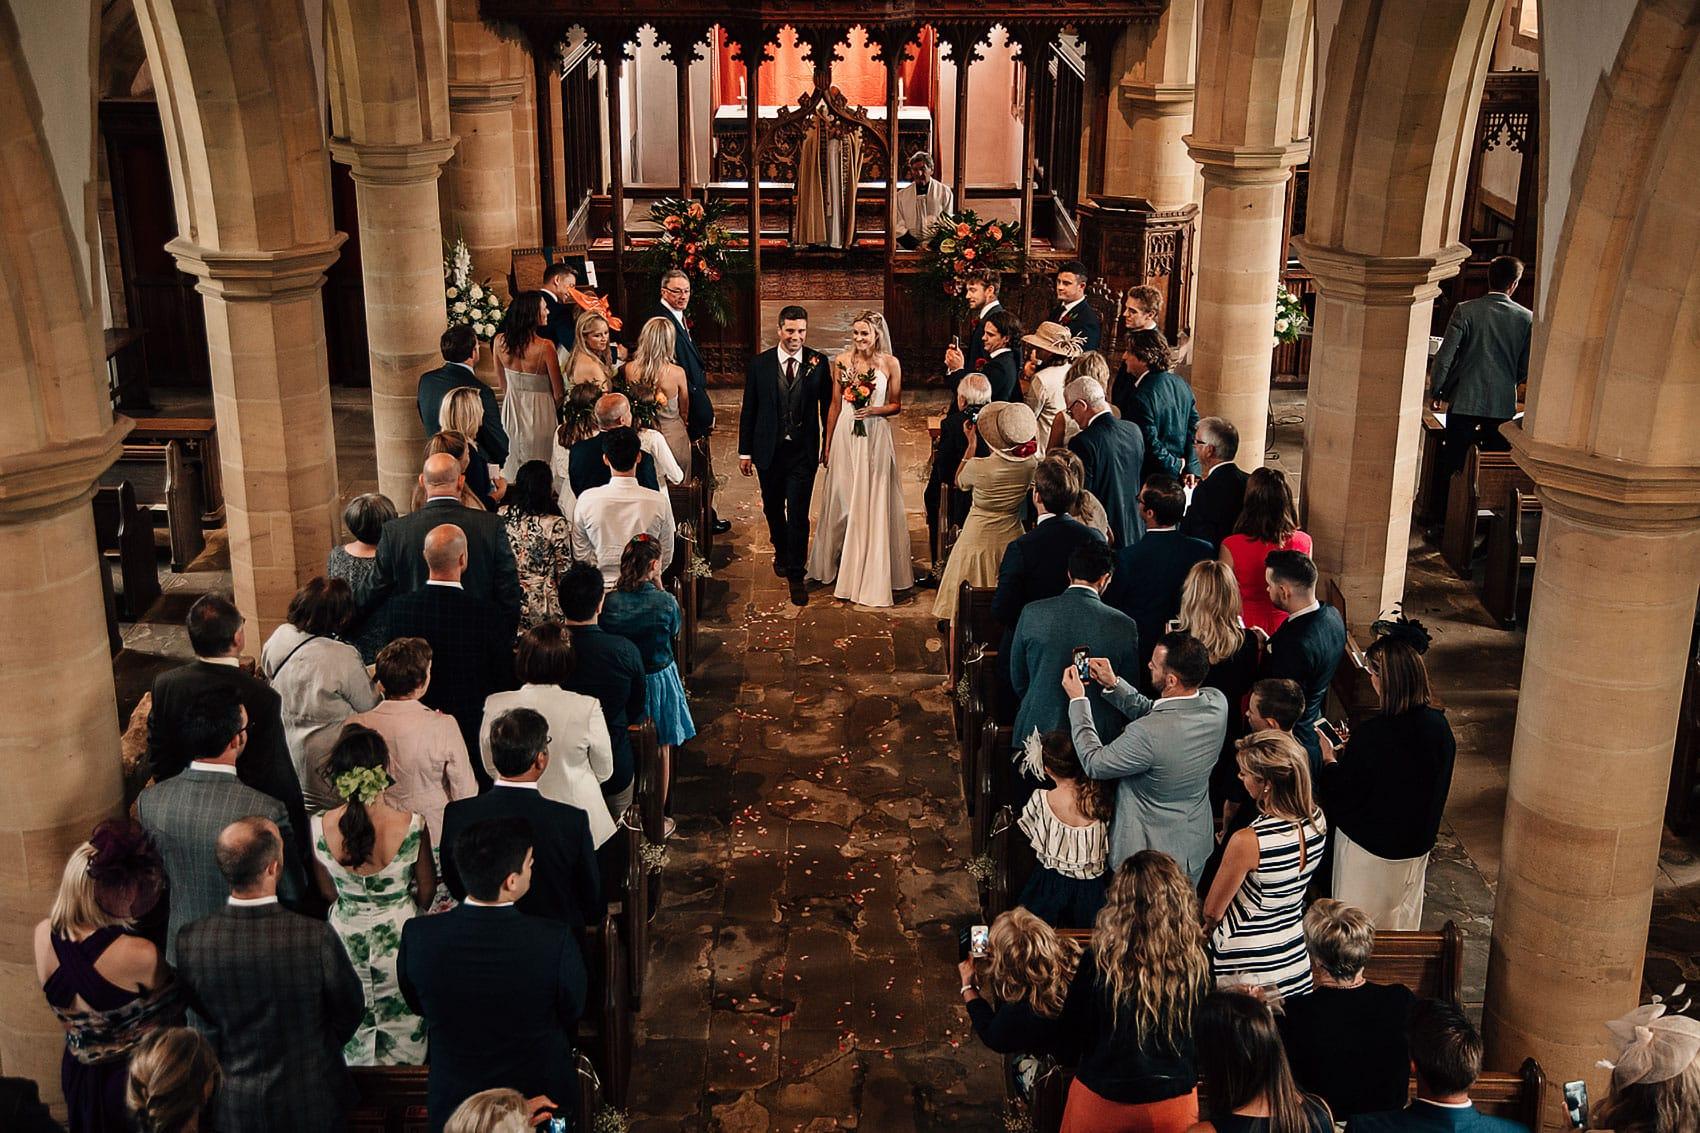 church wedding ceremony photography